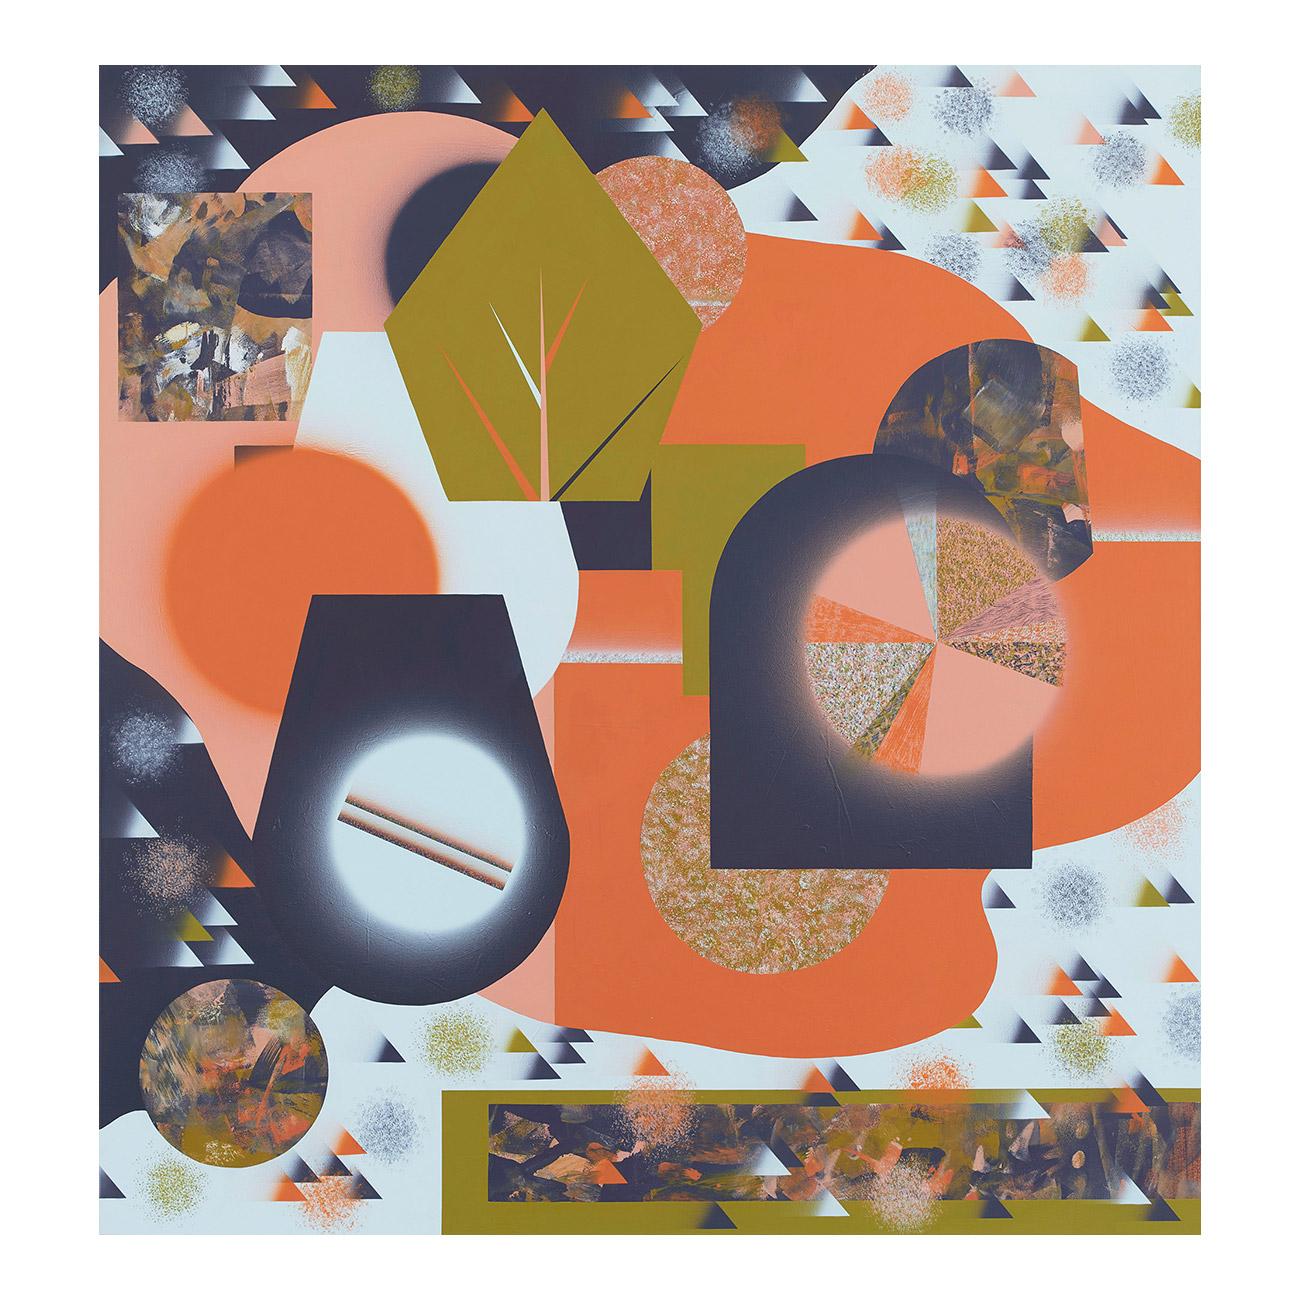 Indigoweiss/Geduld . 2018 . 180 x 170 cm . Acryl auf Baumwolle